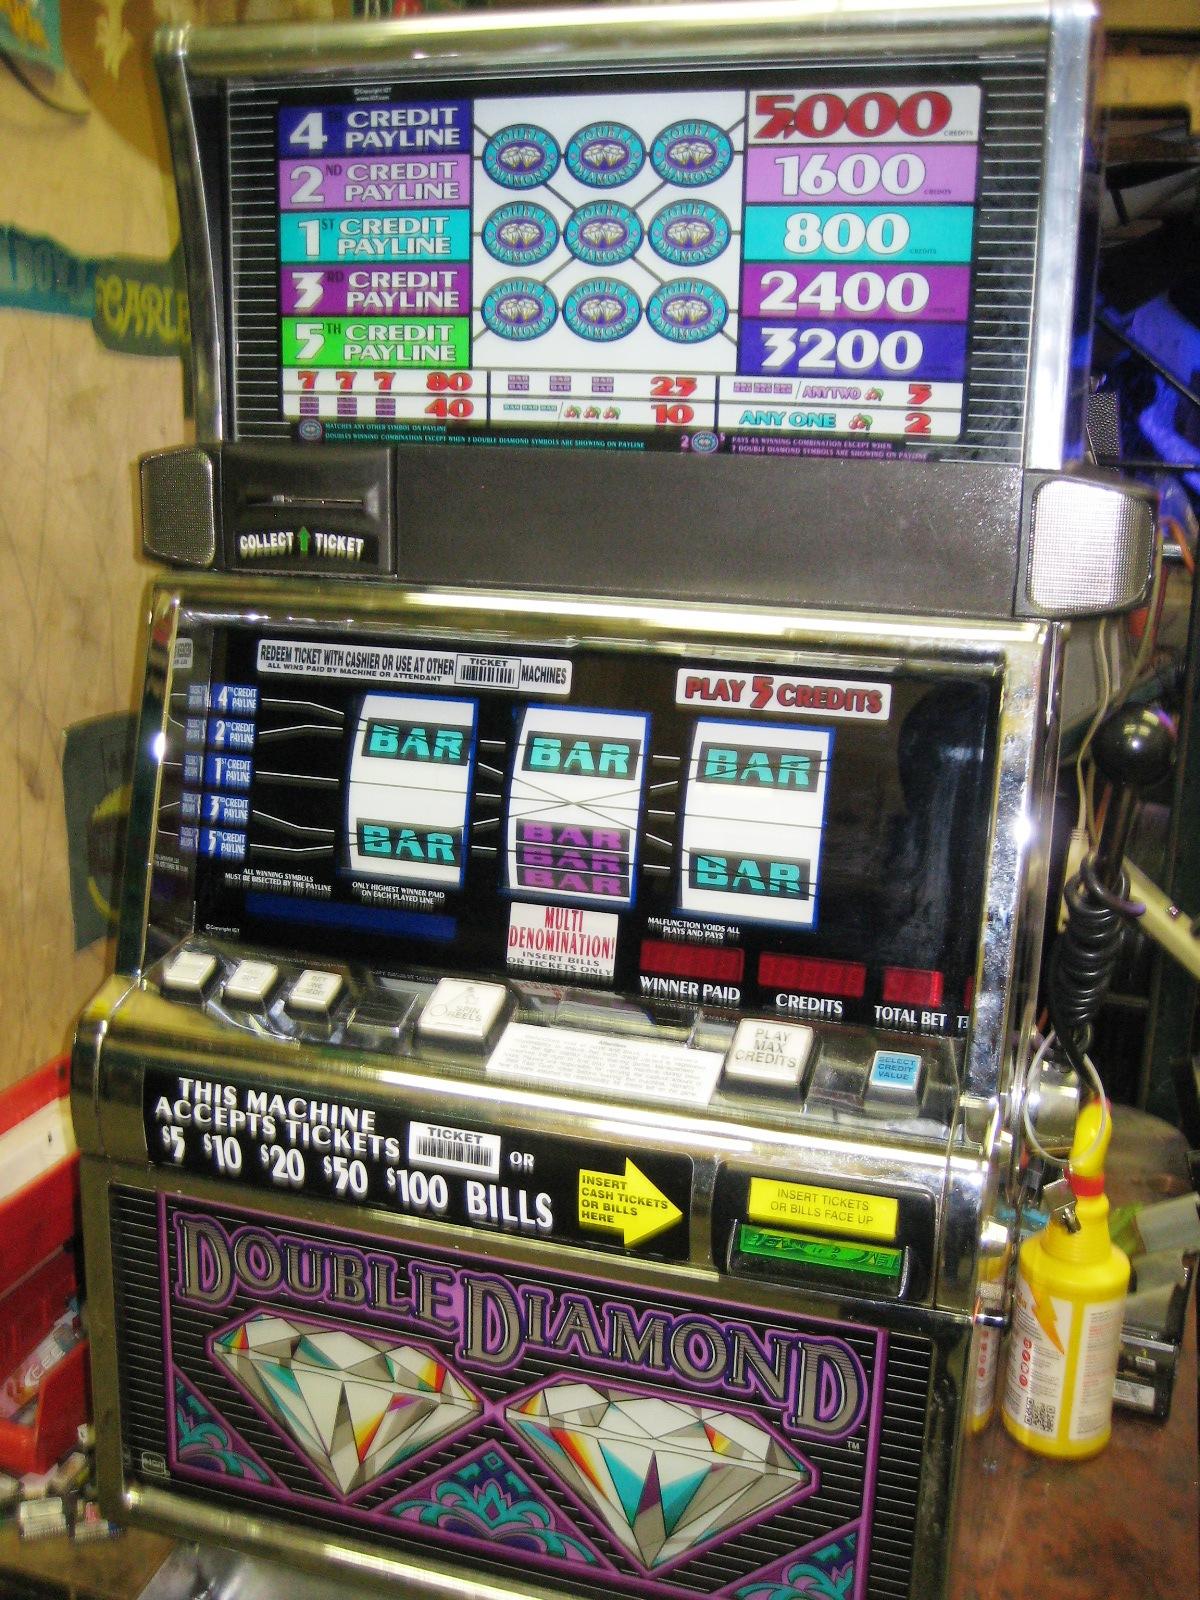 free double diamond slot machines online